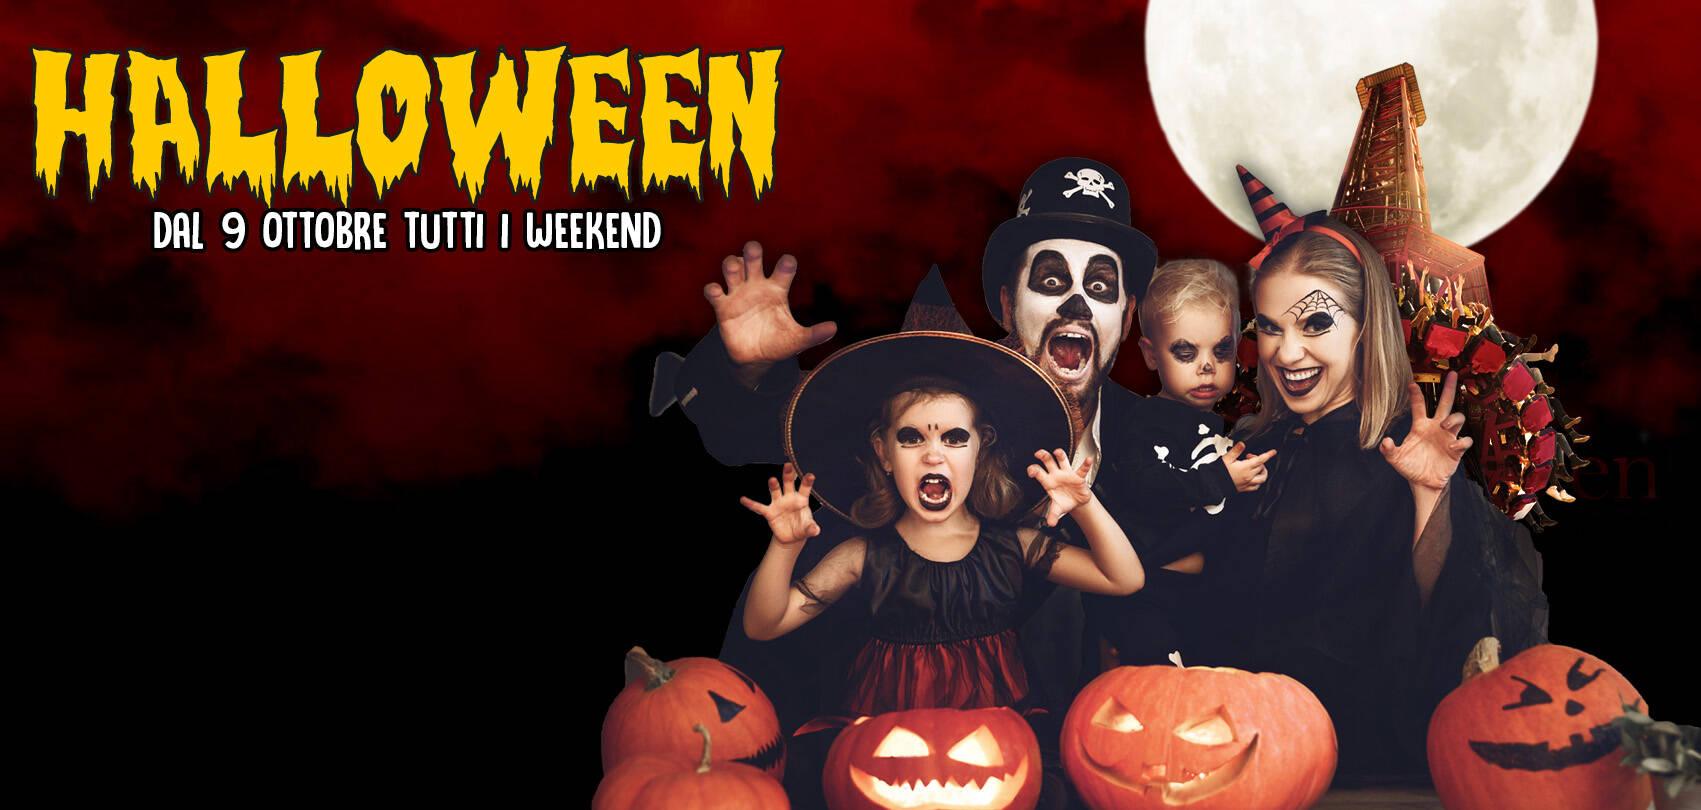 MagicLand Halloween